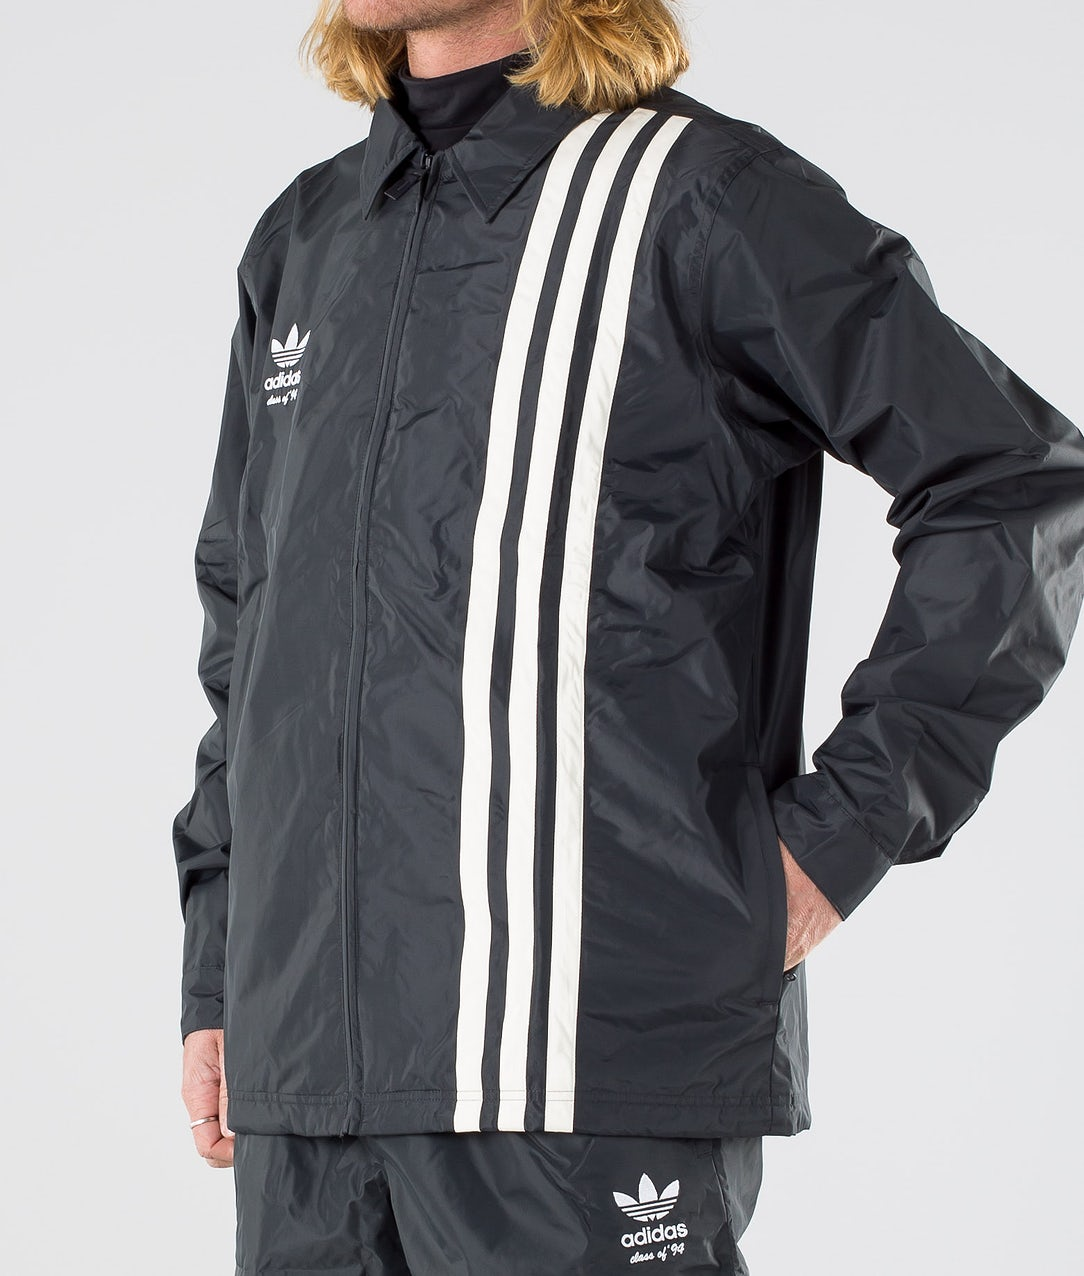 Adidas Snowboarding Civilian Snowboard Jacket Carbon Active Blue Cream White Ridestore Com